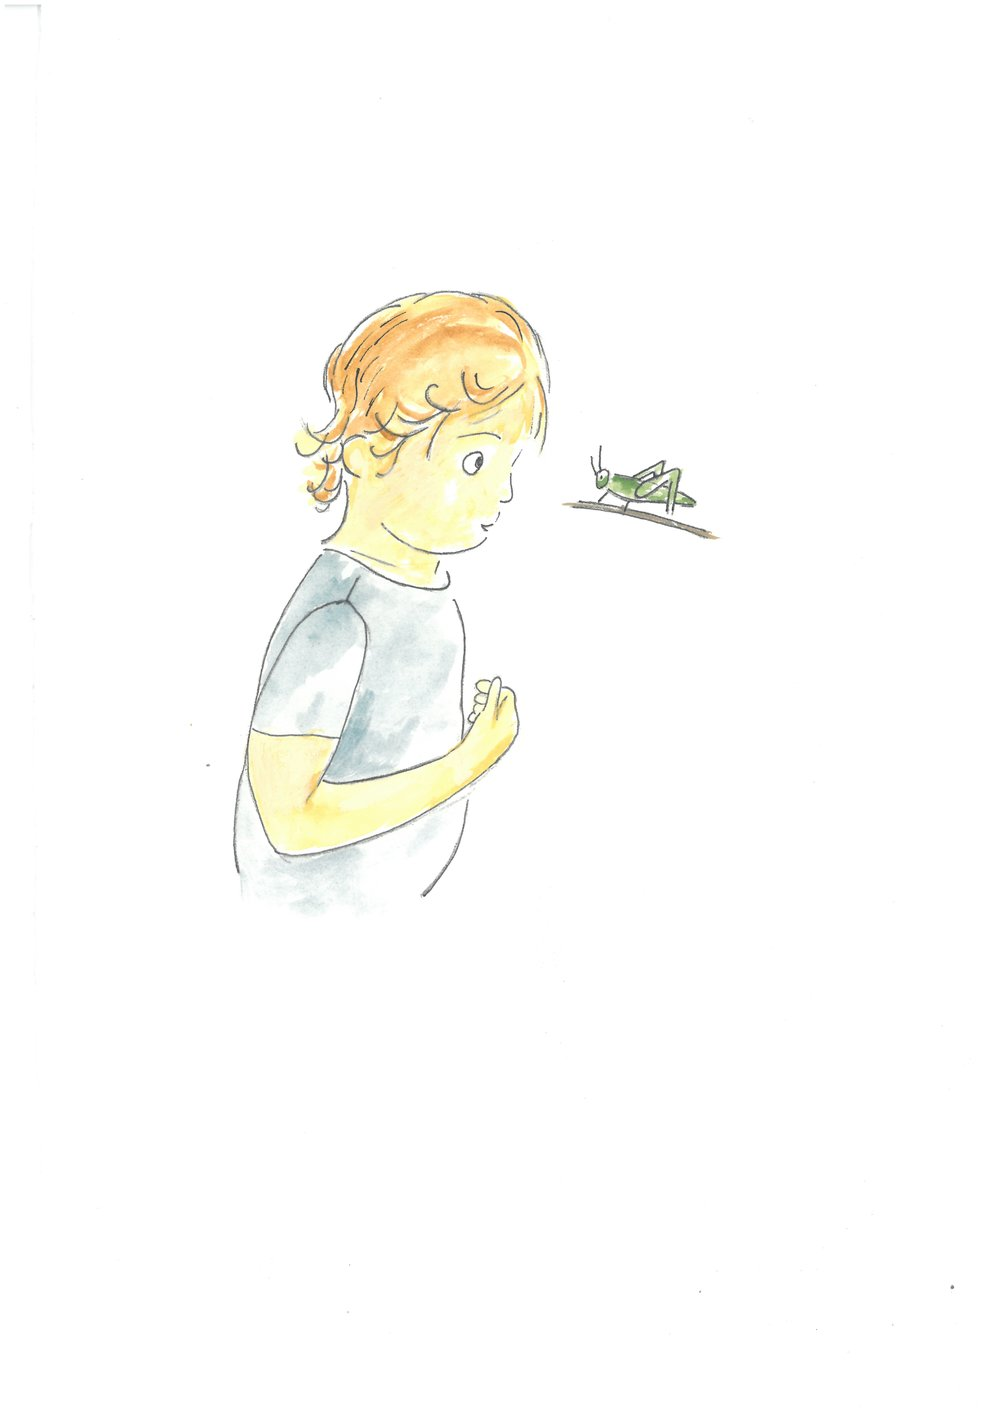 'Una historia preciosa, con estupendas ilustraciones en acuarela. ¡muy recomendable!' Amazon Australia. -